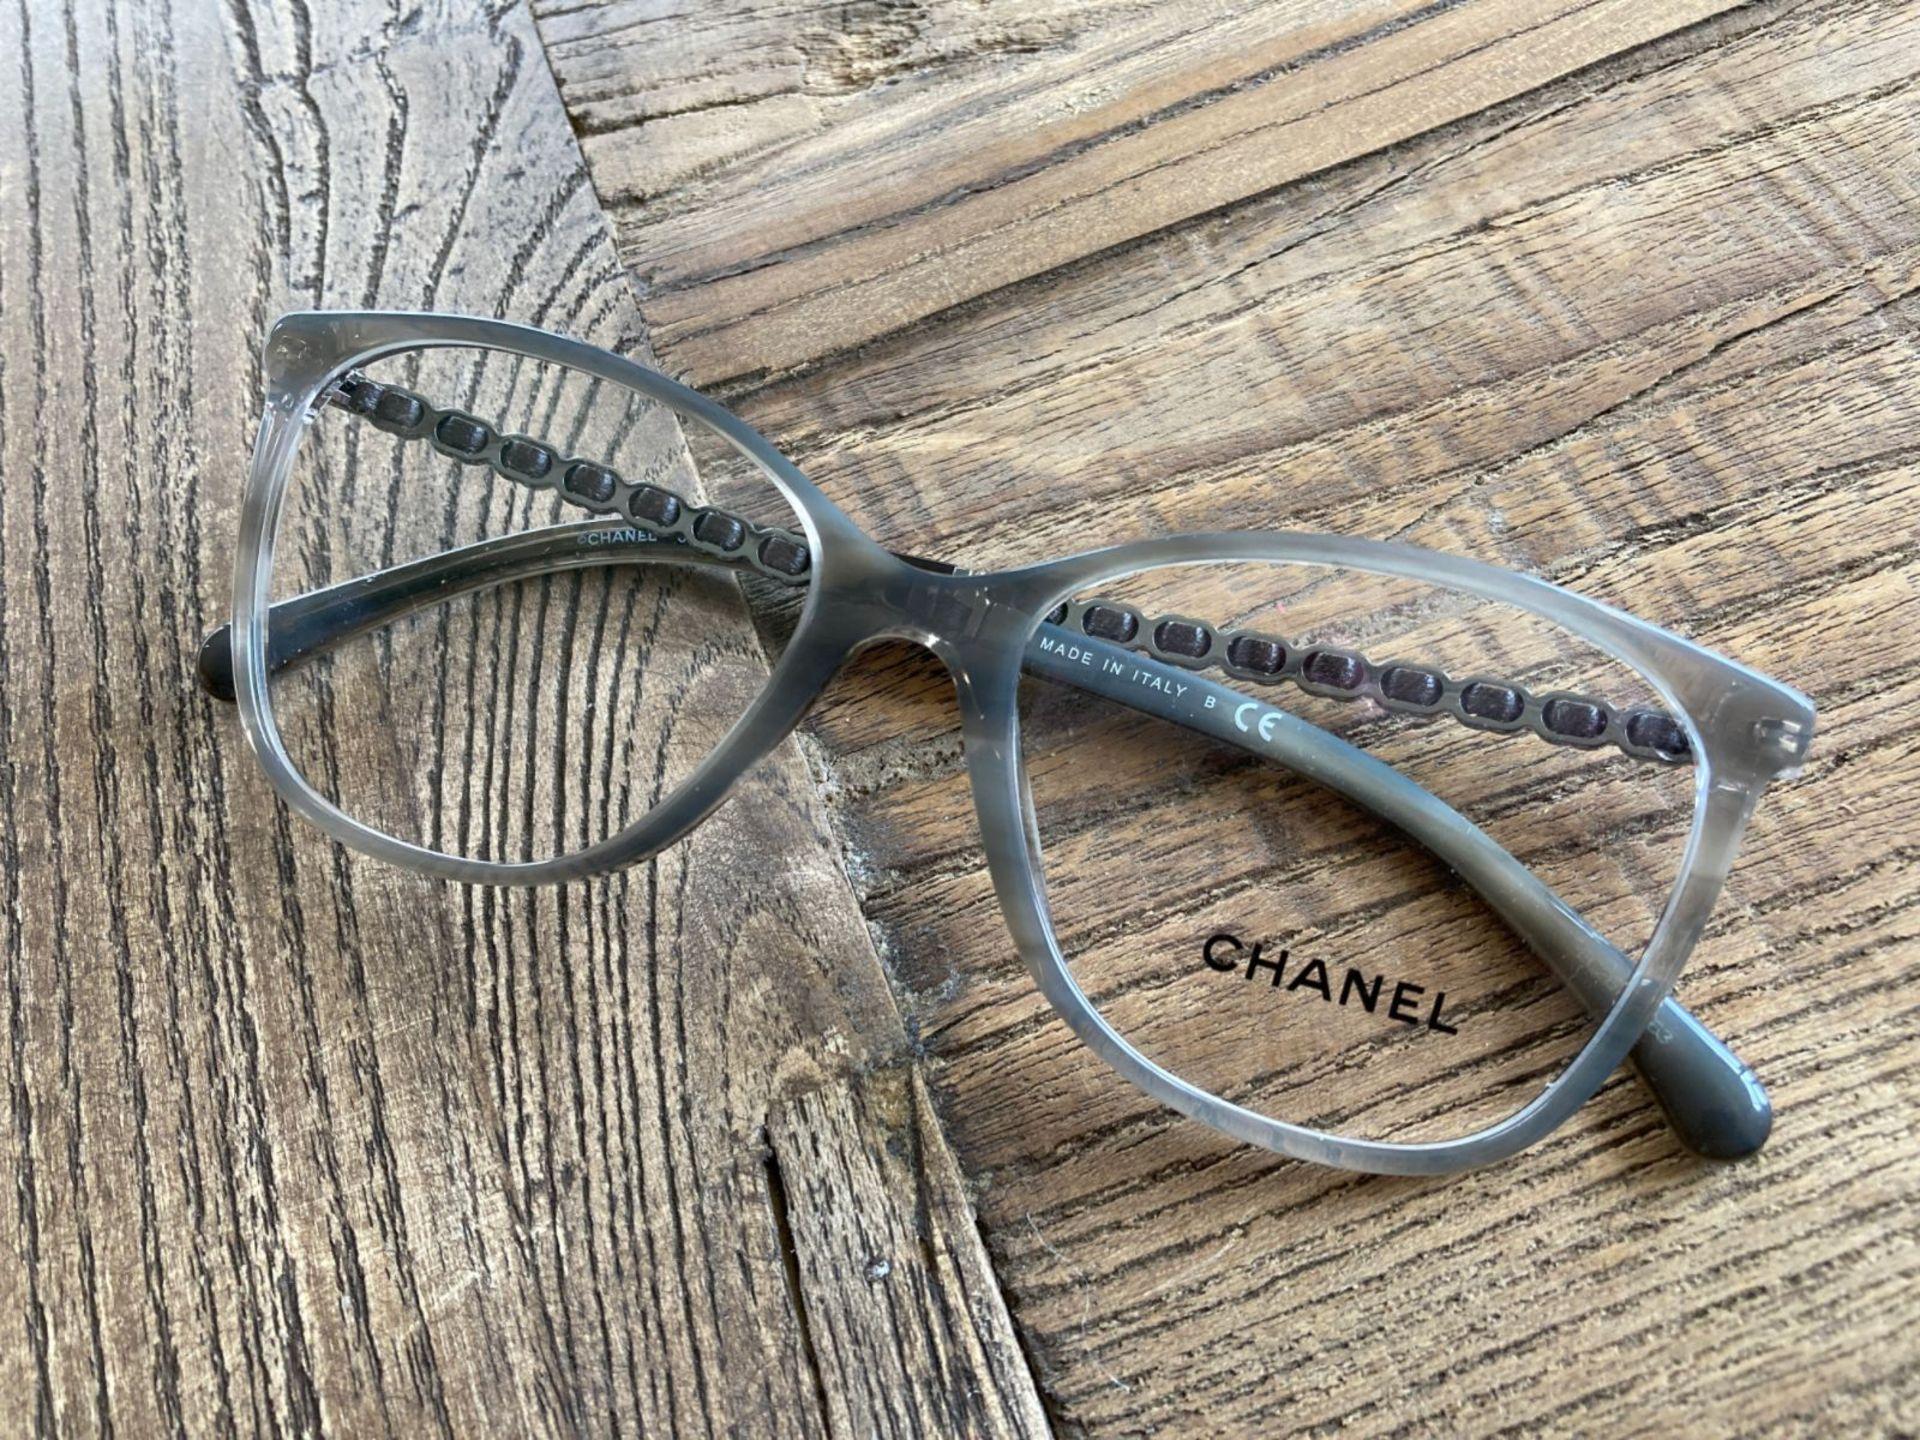 CHANEL GLASSES/ FRAMES